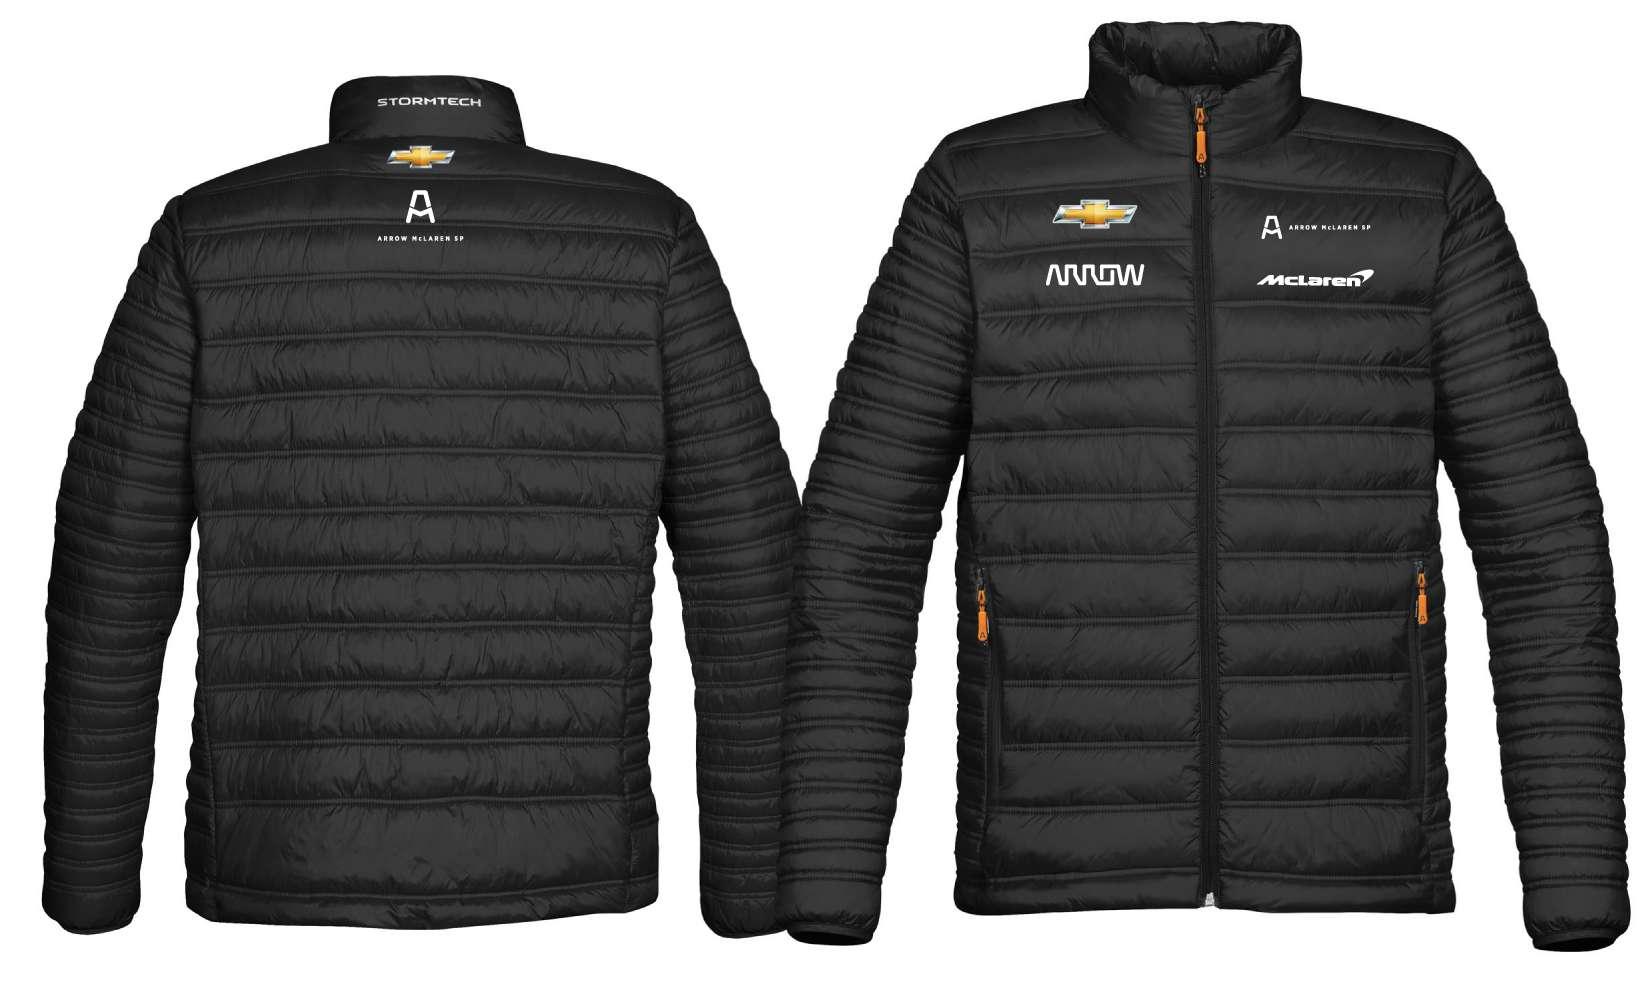 MEDIUM Men's Official Team Puffer Jacket